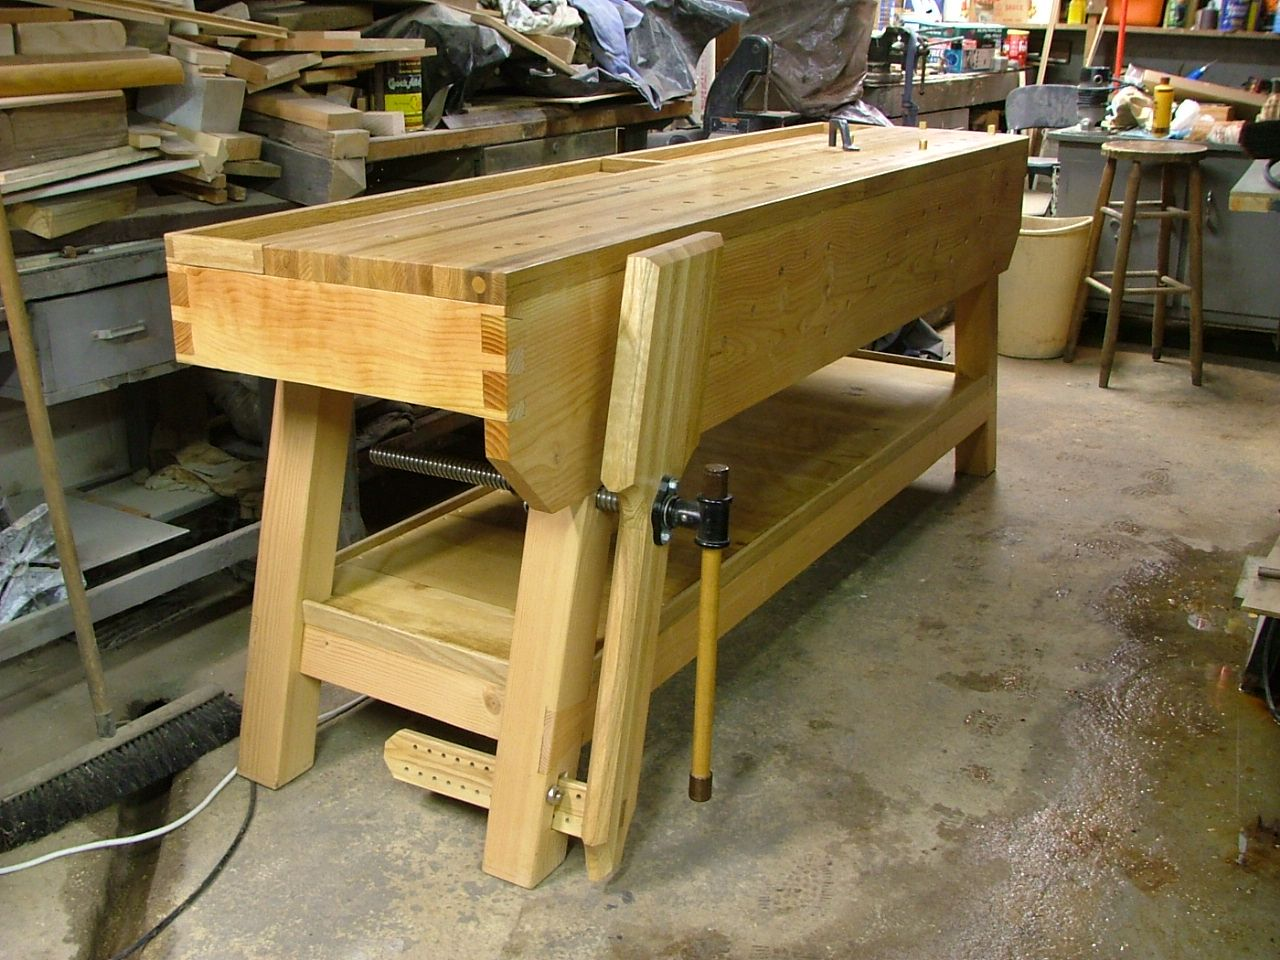 Slant legged Nicholson bench